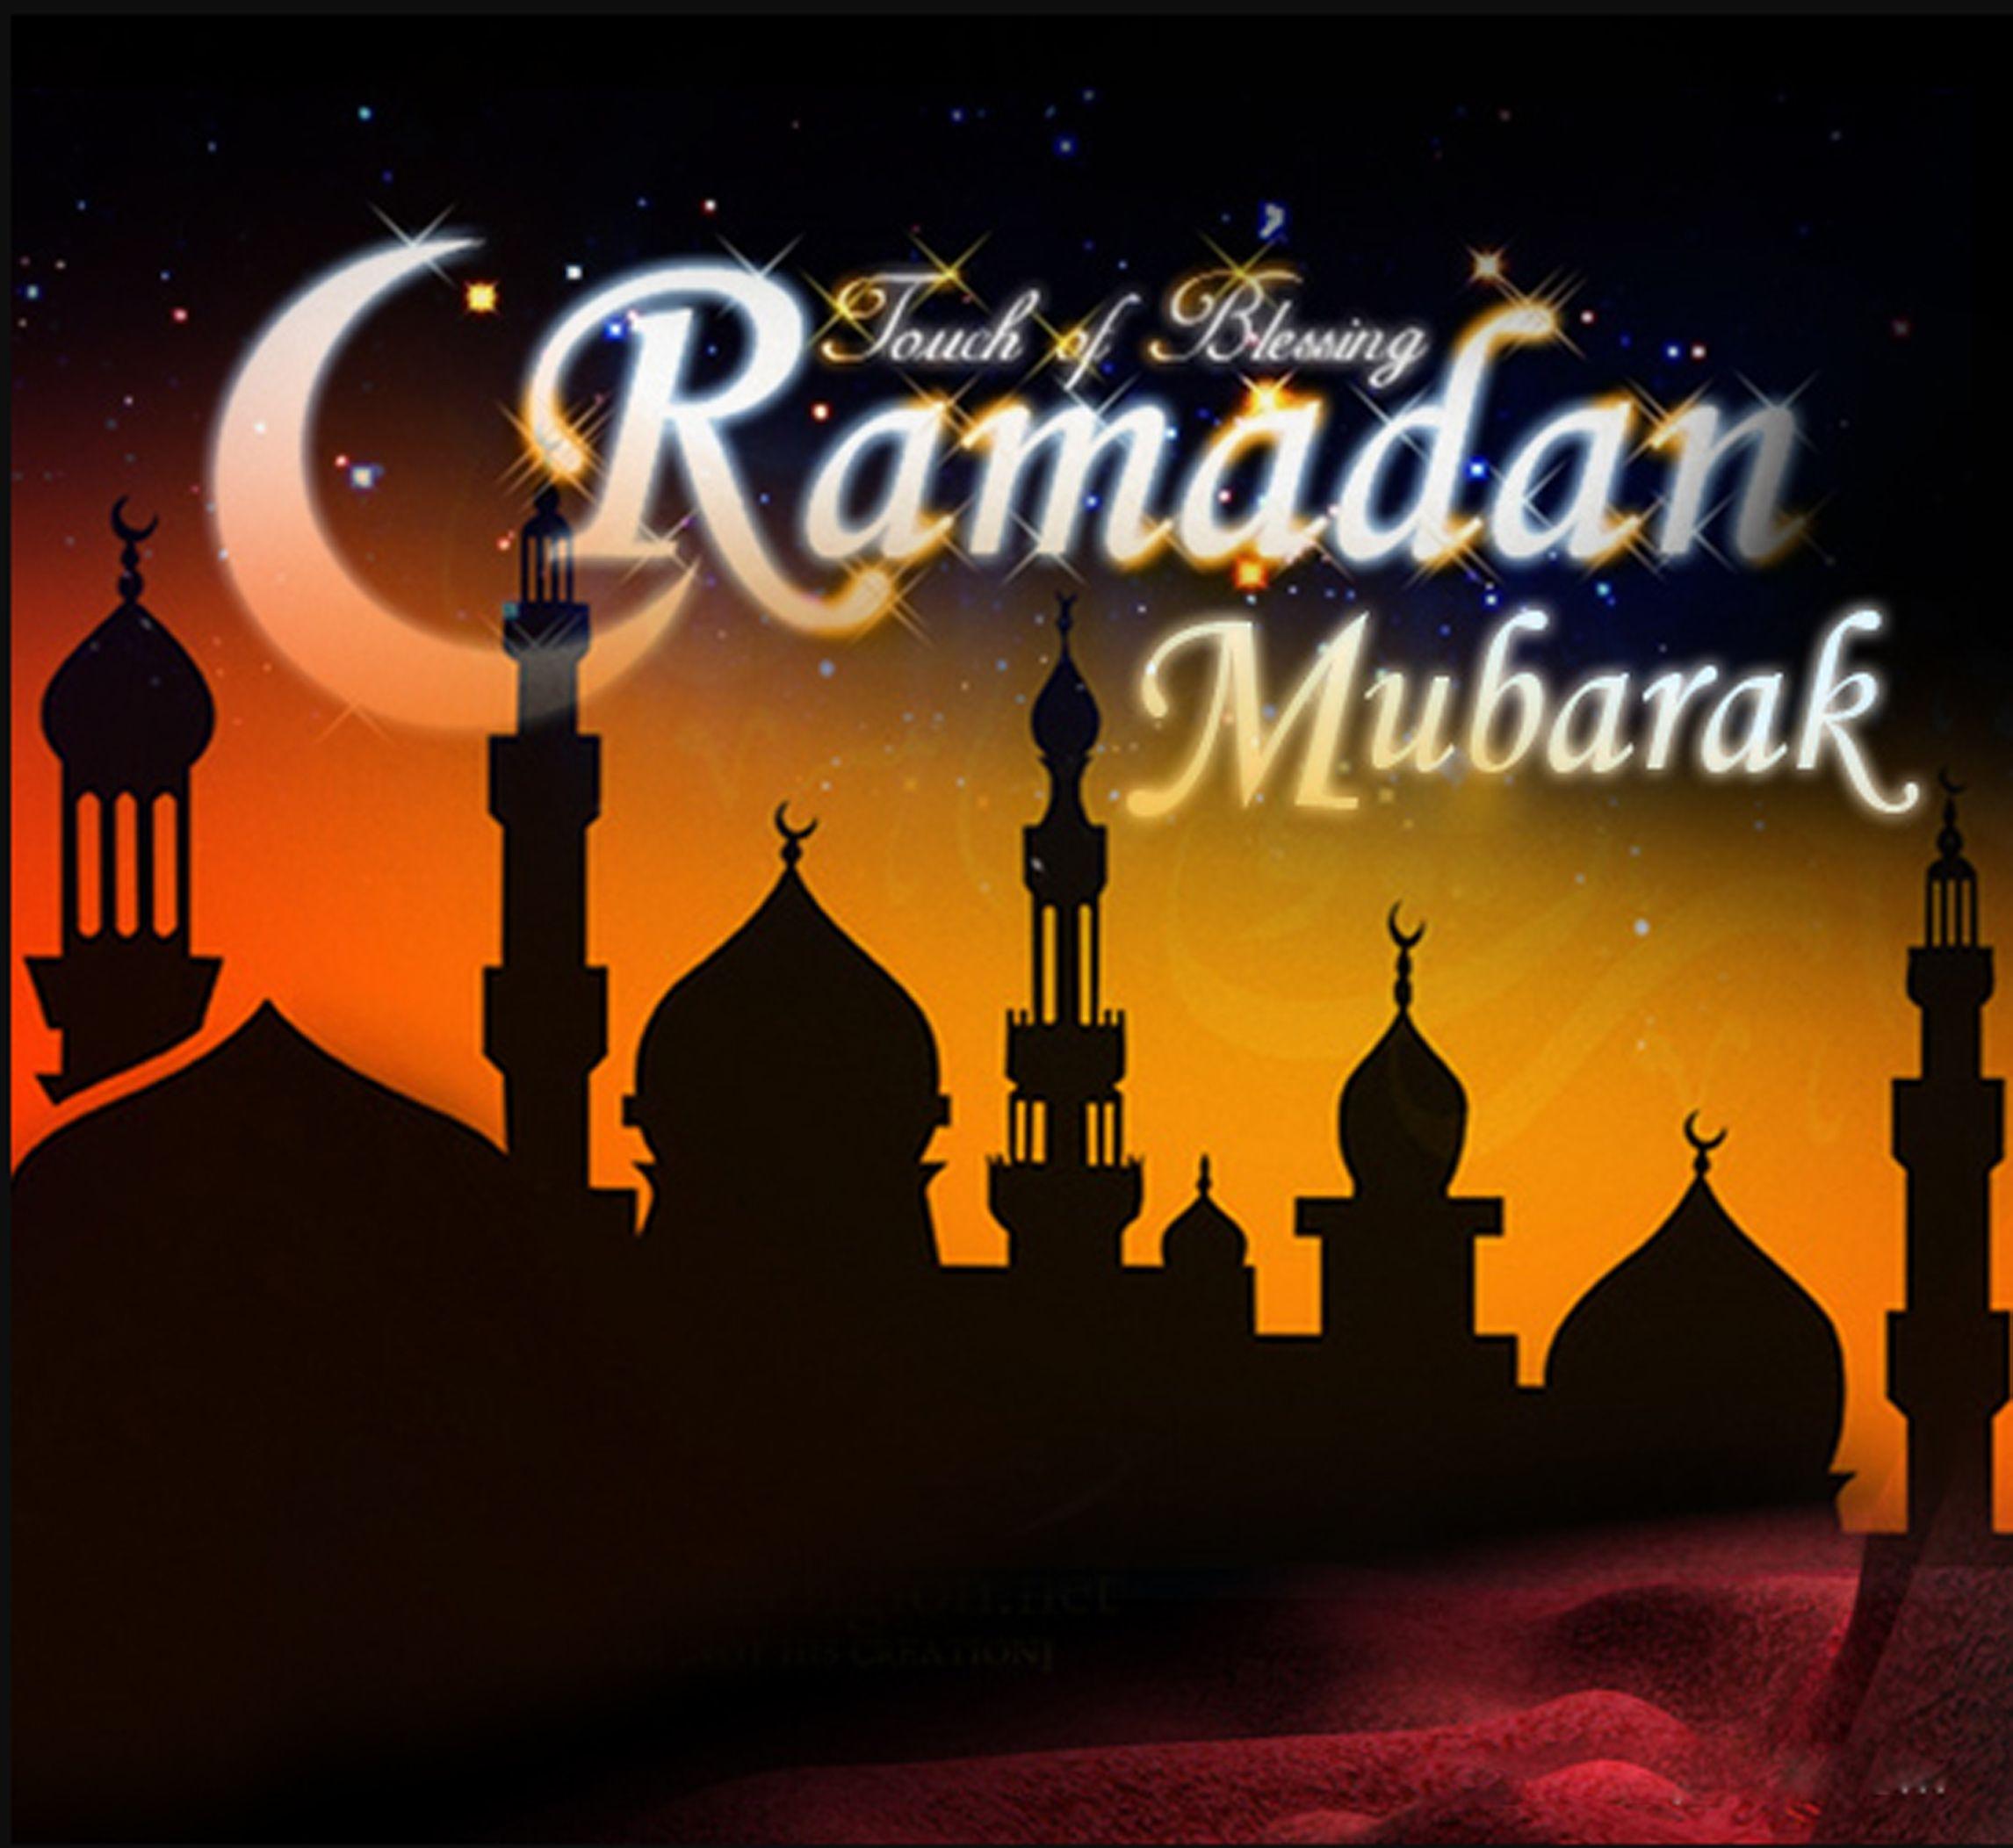 Best Ramadan Mubarak Quotes 2019 Ramadanquotes Ramadanwishes2019 Ramadanmessages Rama Ramadan Kareem Pictures Ramadan Mubarak Wallpapers Ramadan Greetings